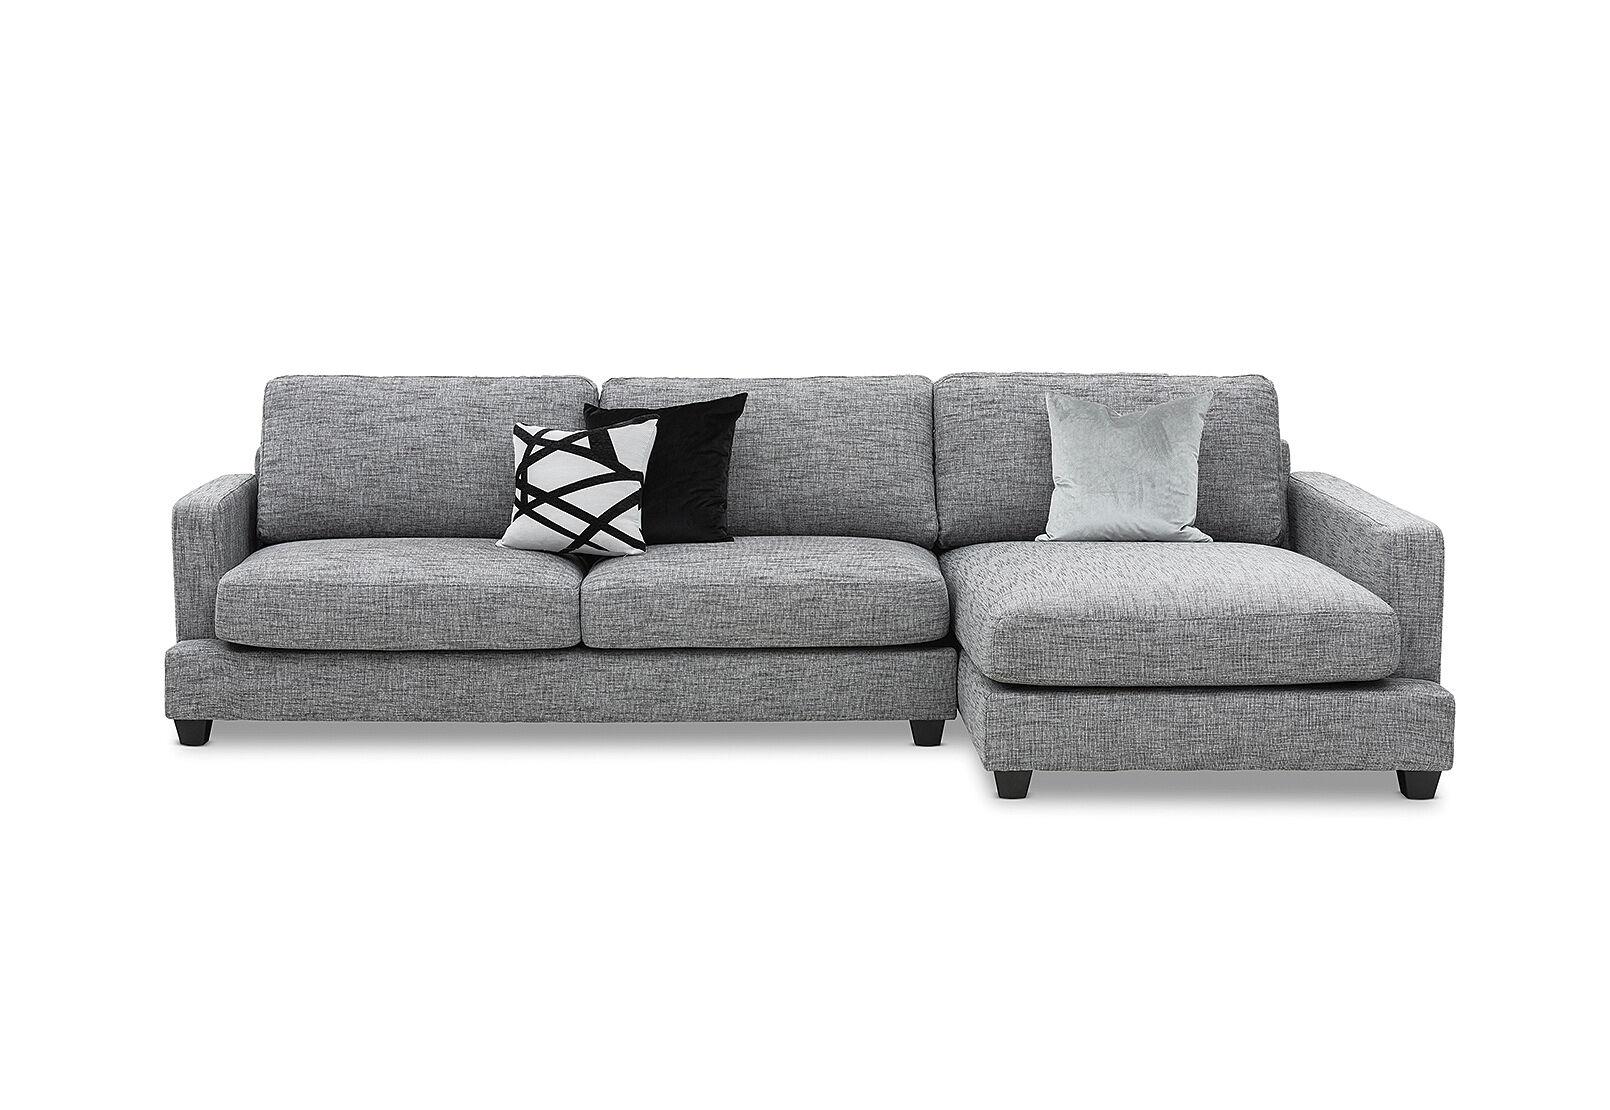 Dark Grey Arianna Fabric Right Hand Facing 3 Seater Chaise Amart Furniture